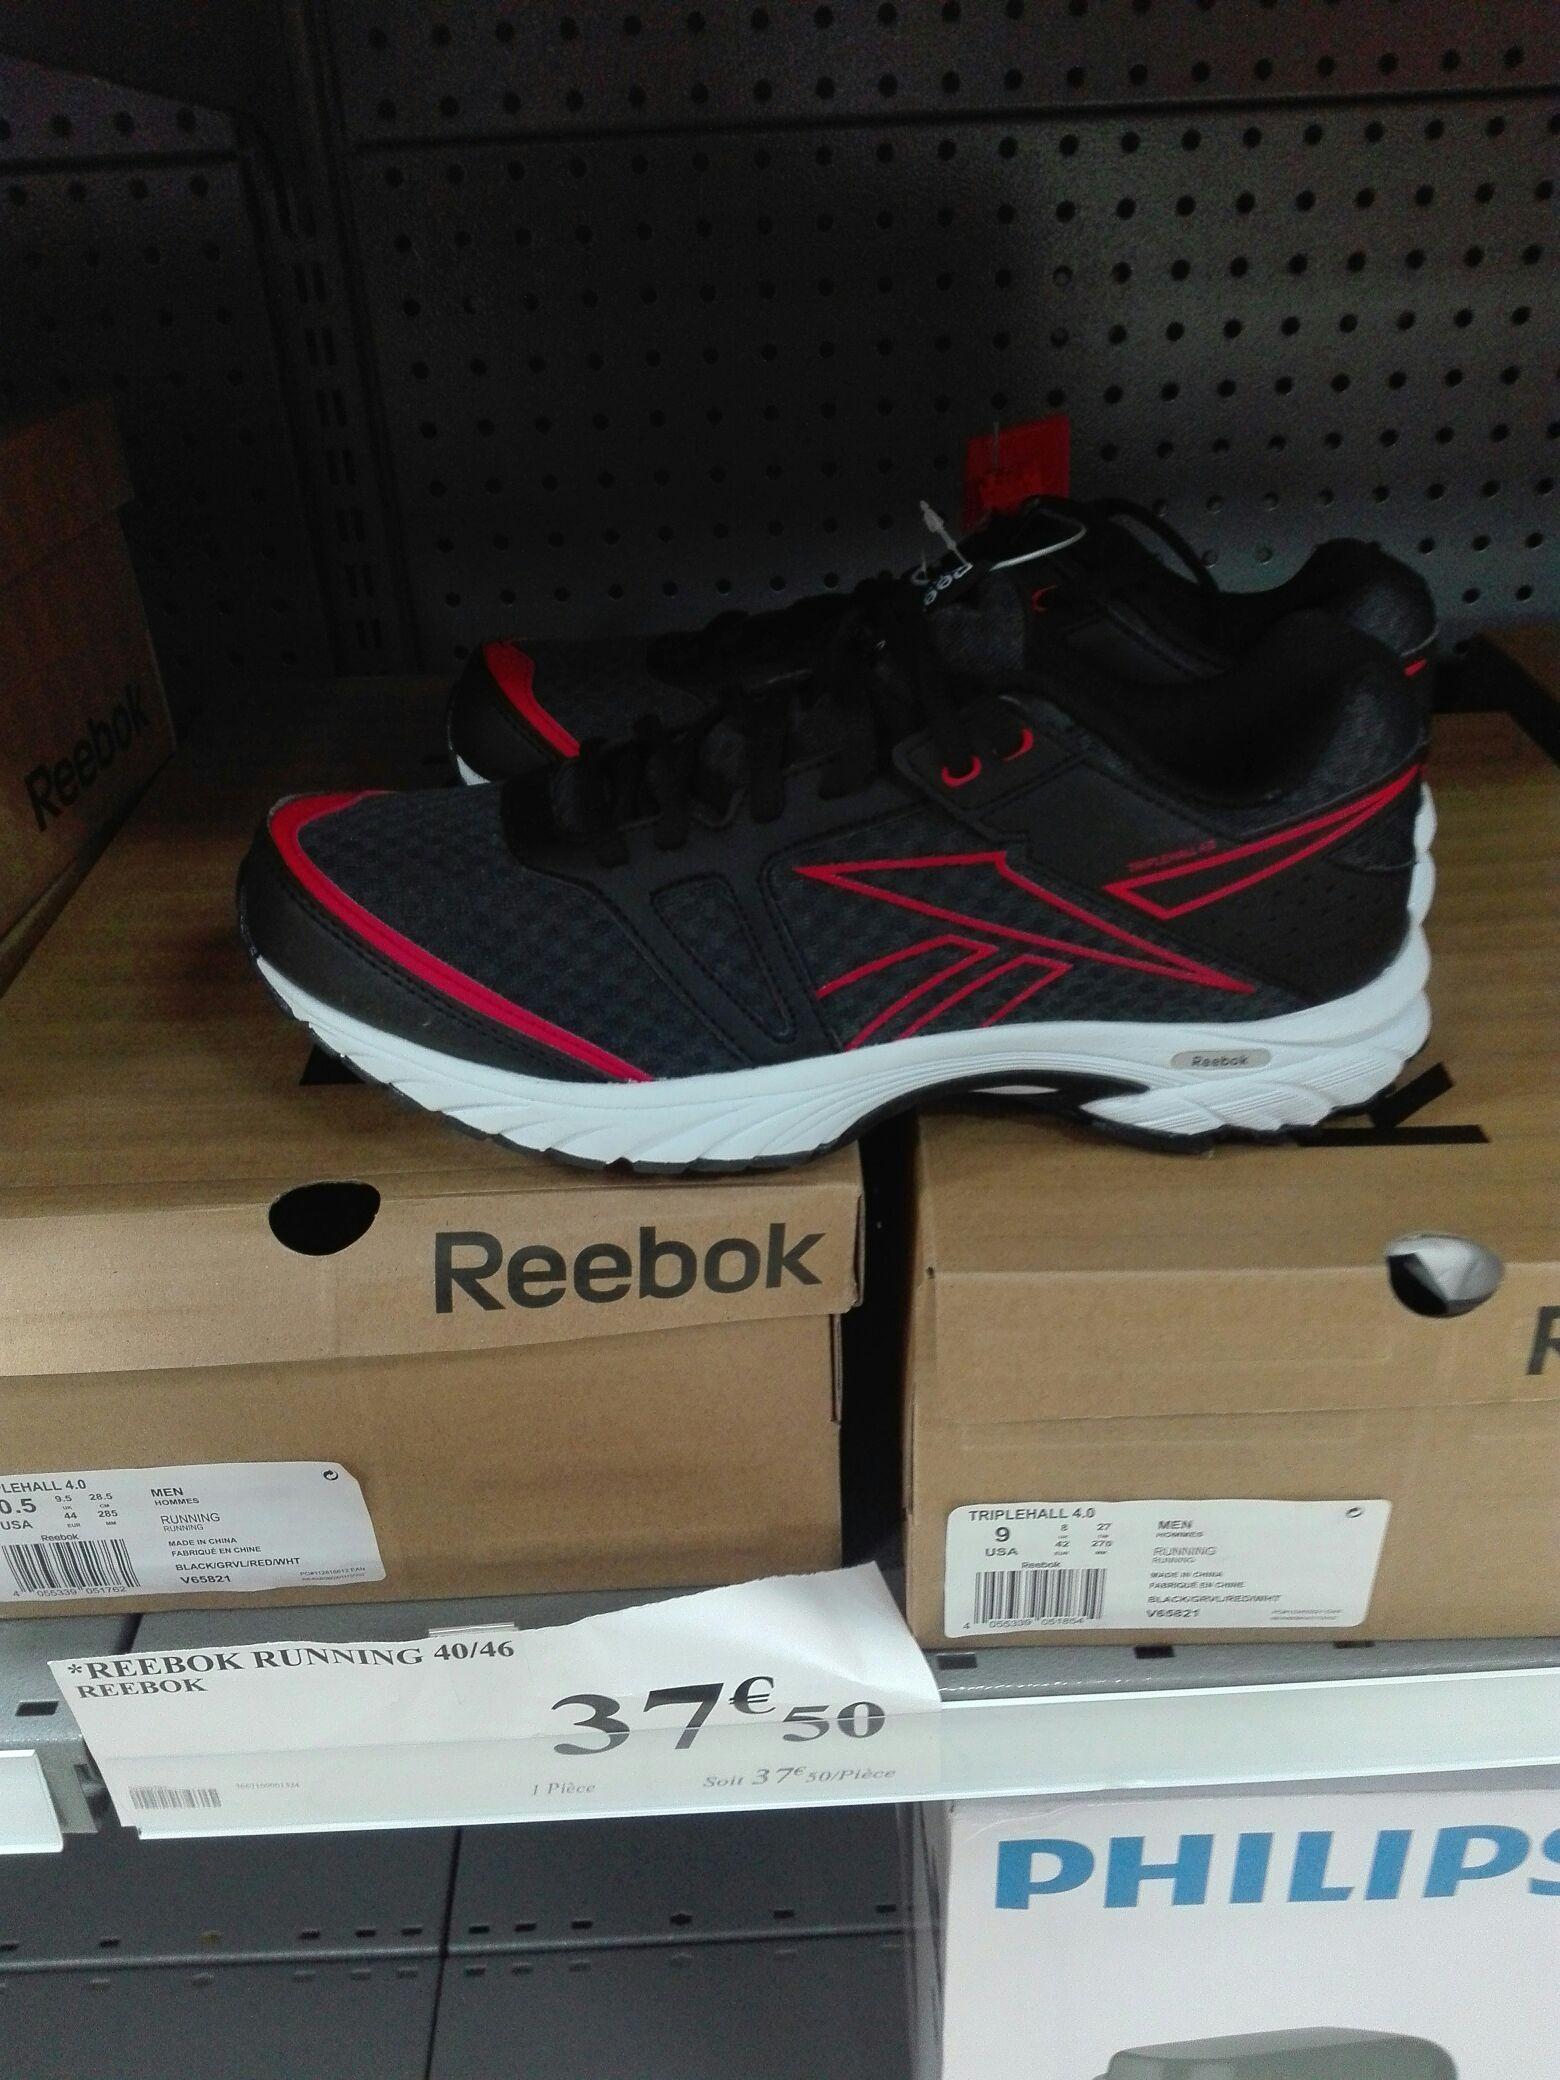 Chaussures Reebok Running - Taille 40 à 46